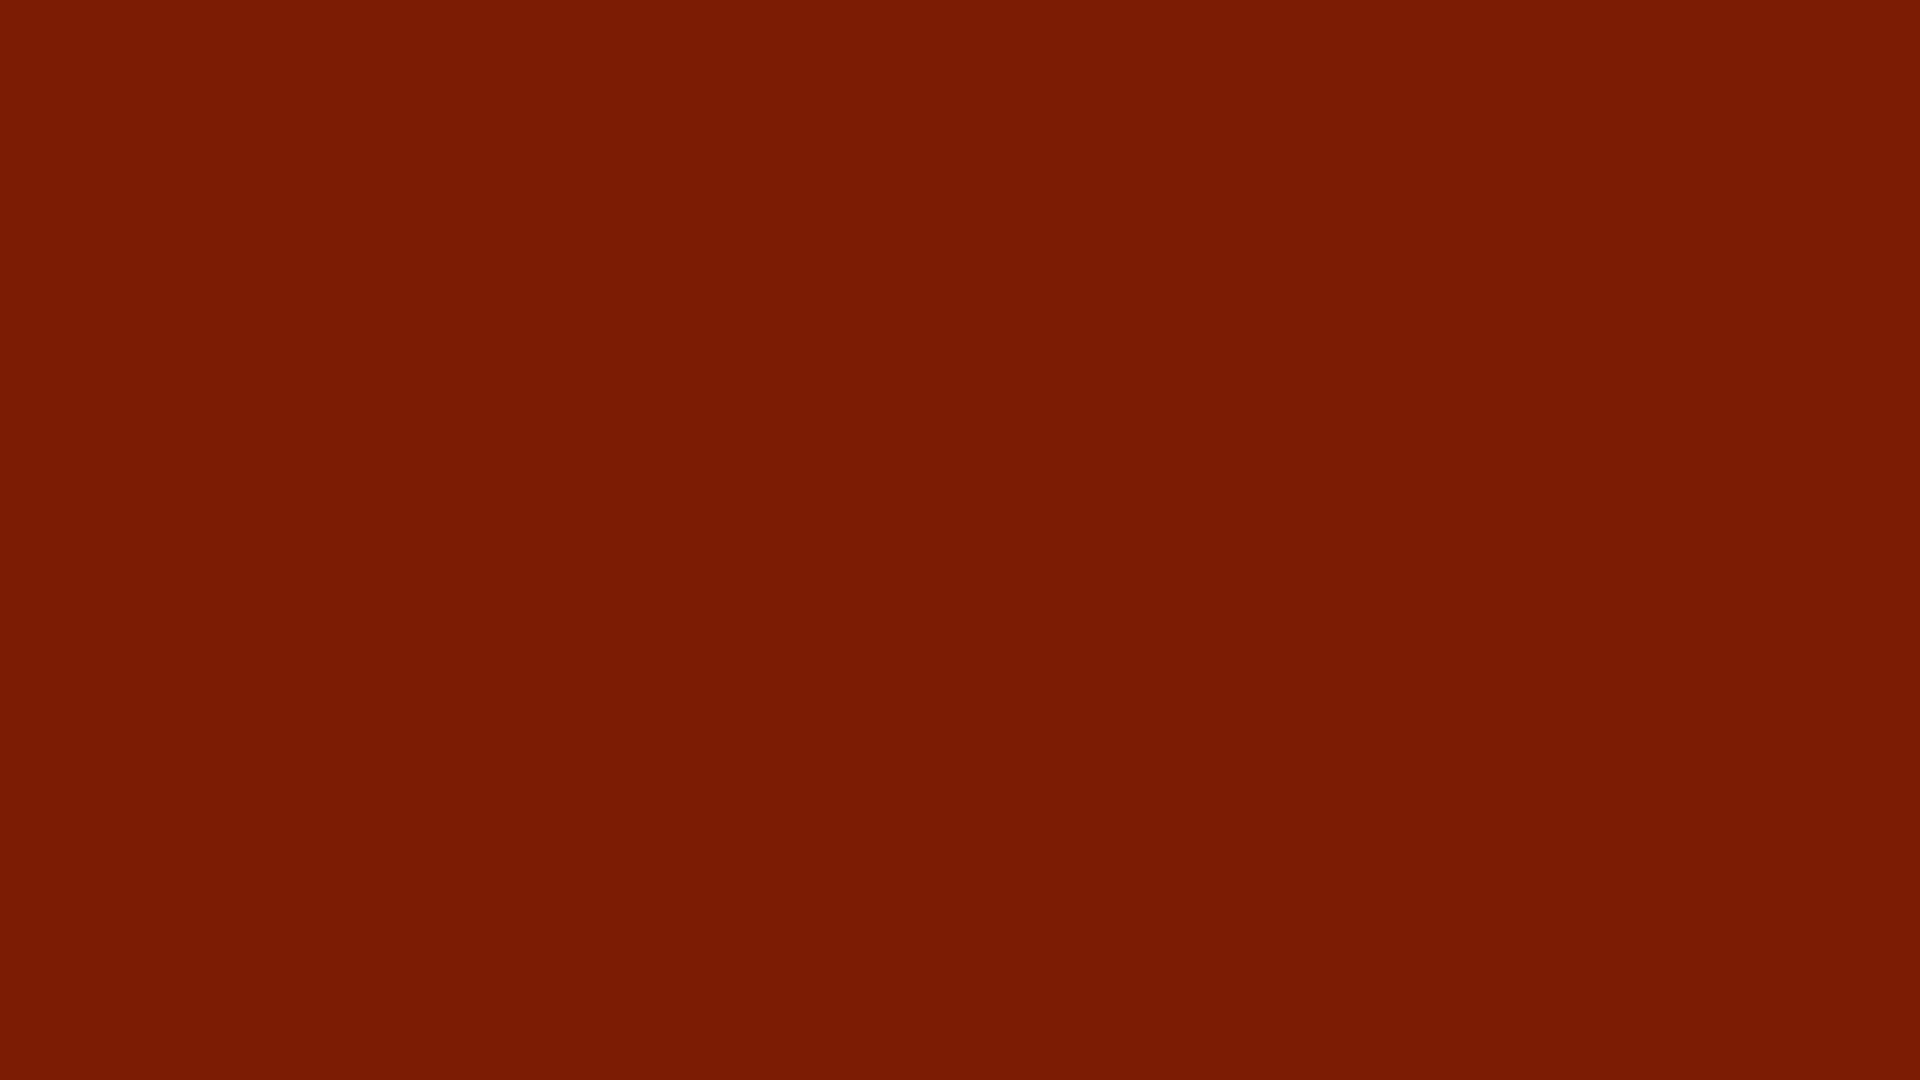 1920x1080 Kenyan Copper Solid Color Background